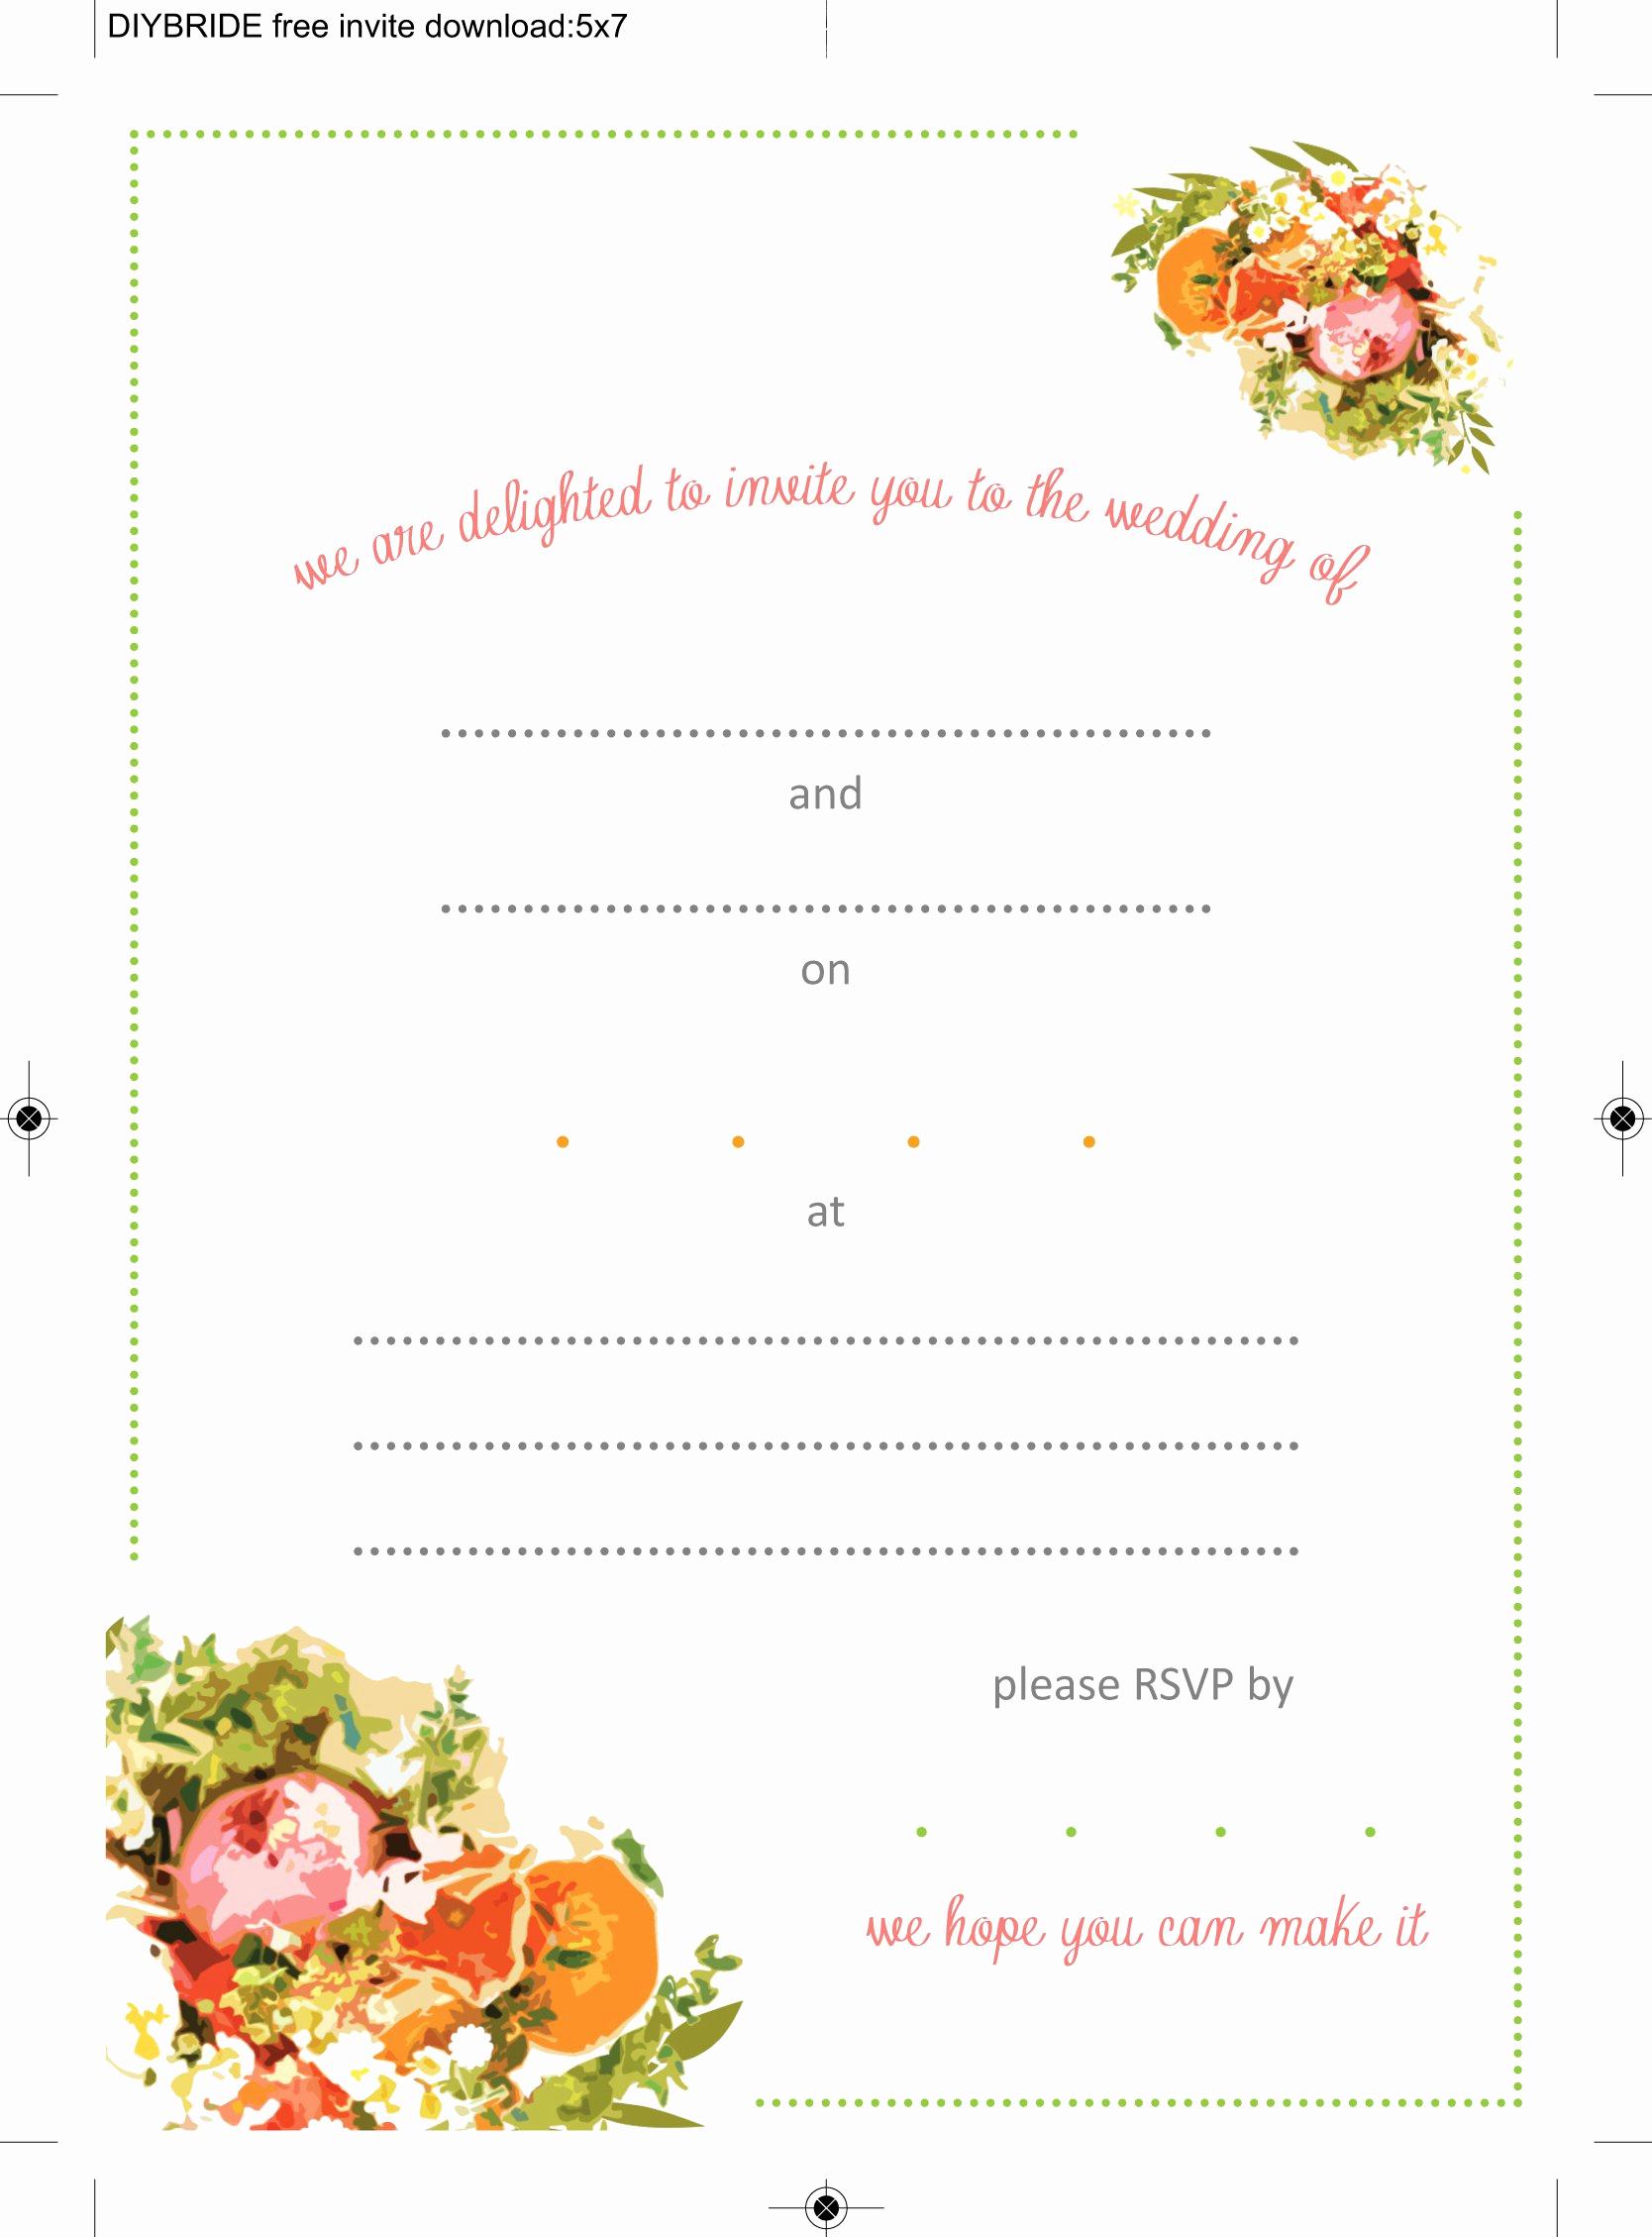 Wedding Invitation Templates Word Elegant Wedding Invitation Templates that are Cute and Easy to